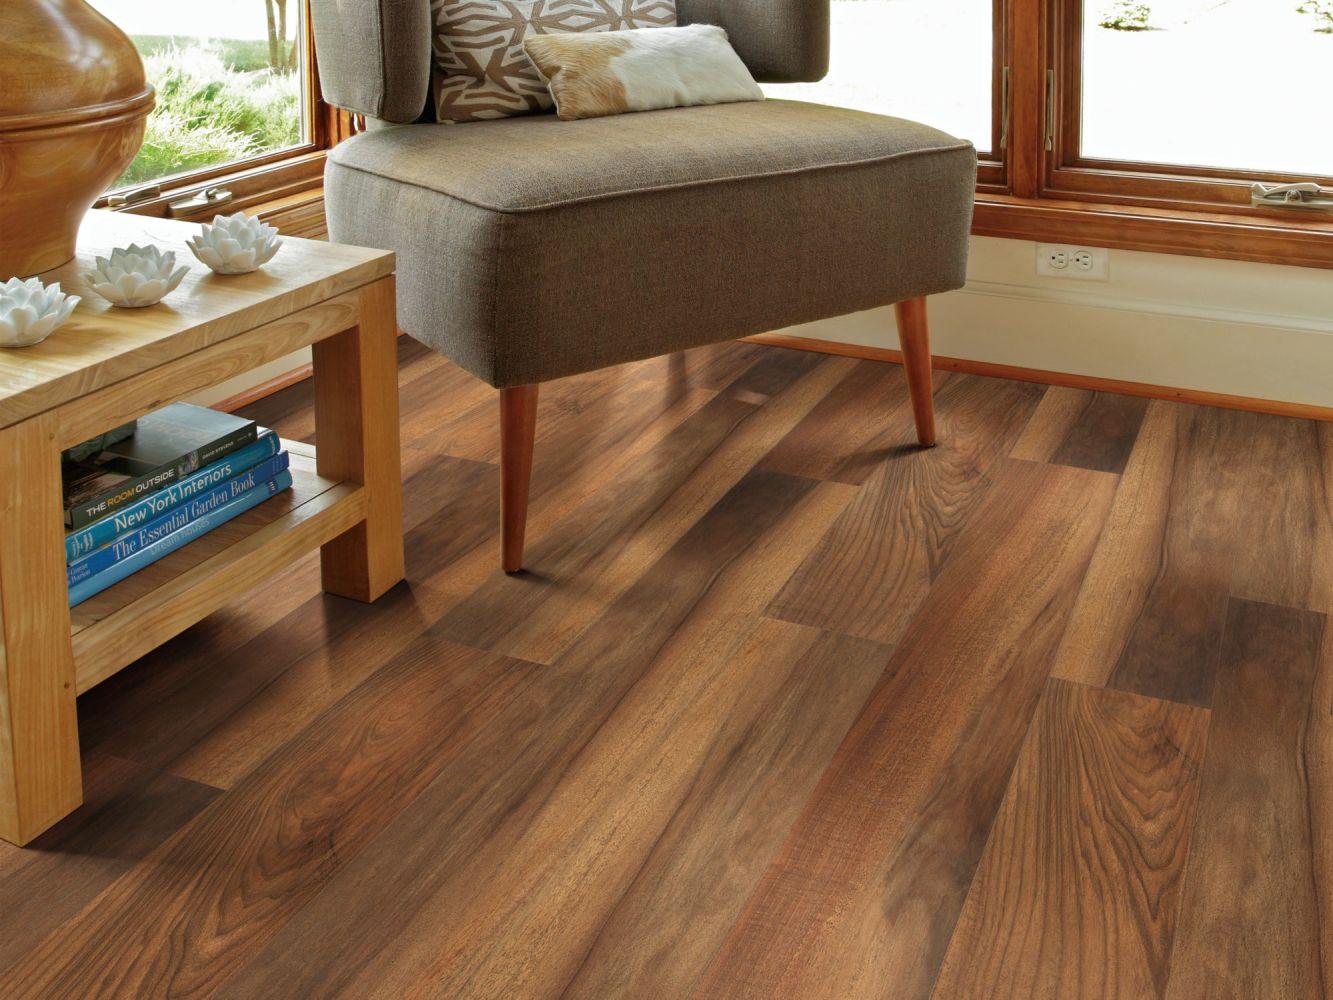 Shaw Floors Reality Homes Rialto Beach Amber Oak 00820_102RH